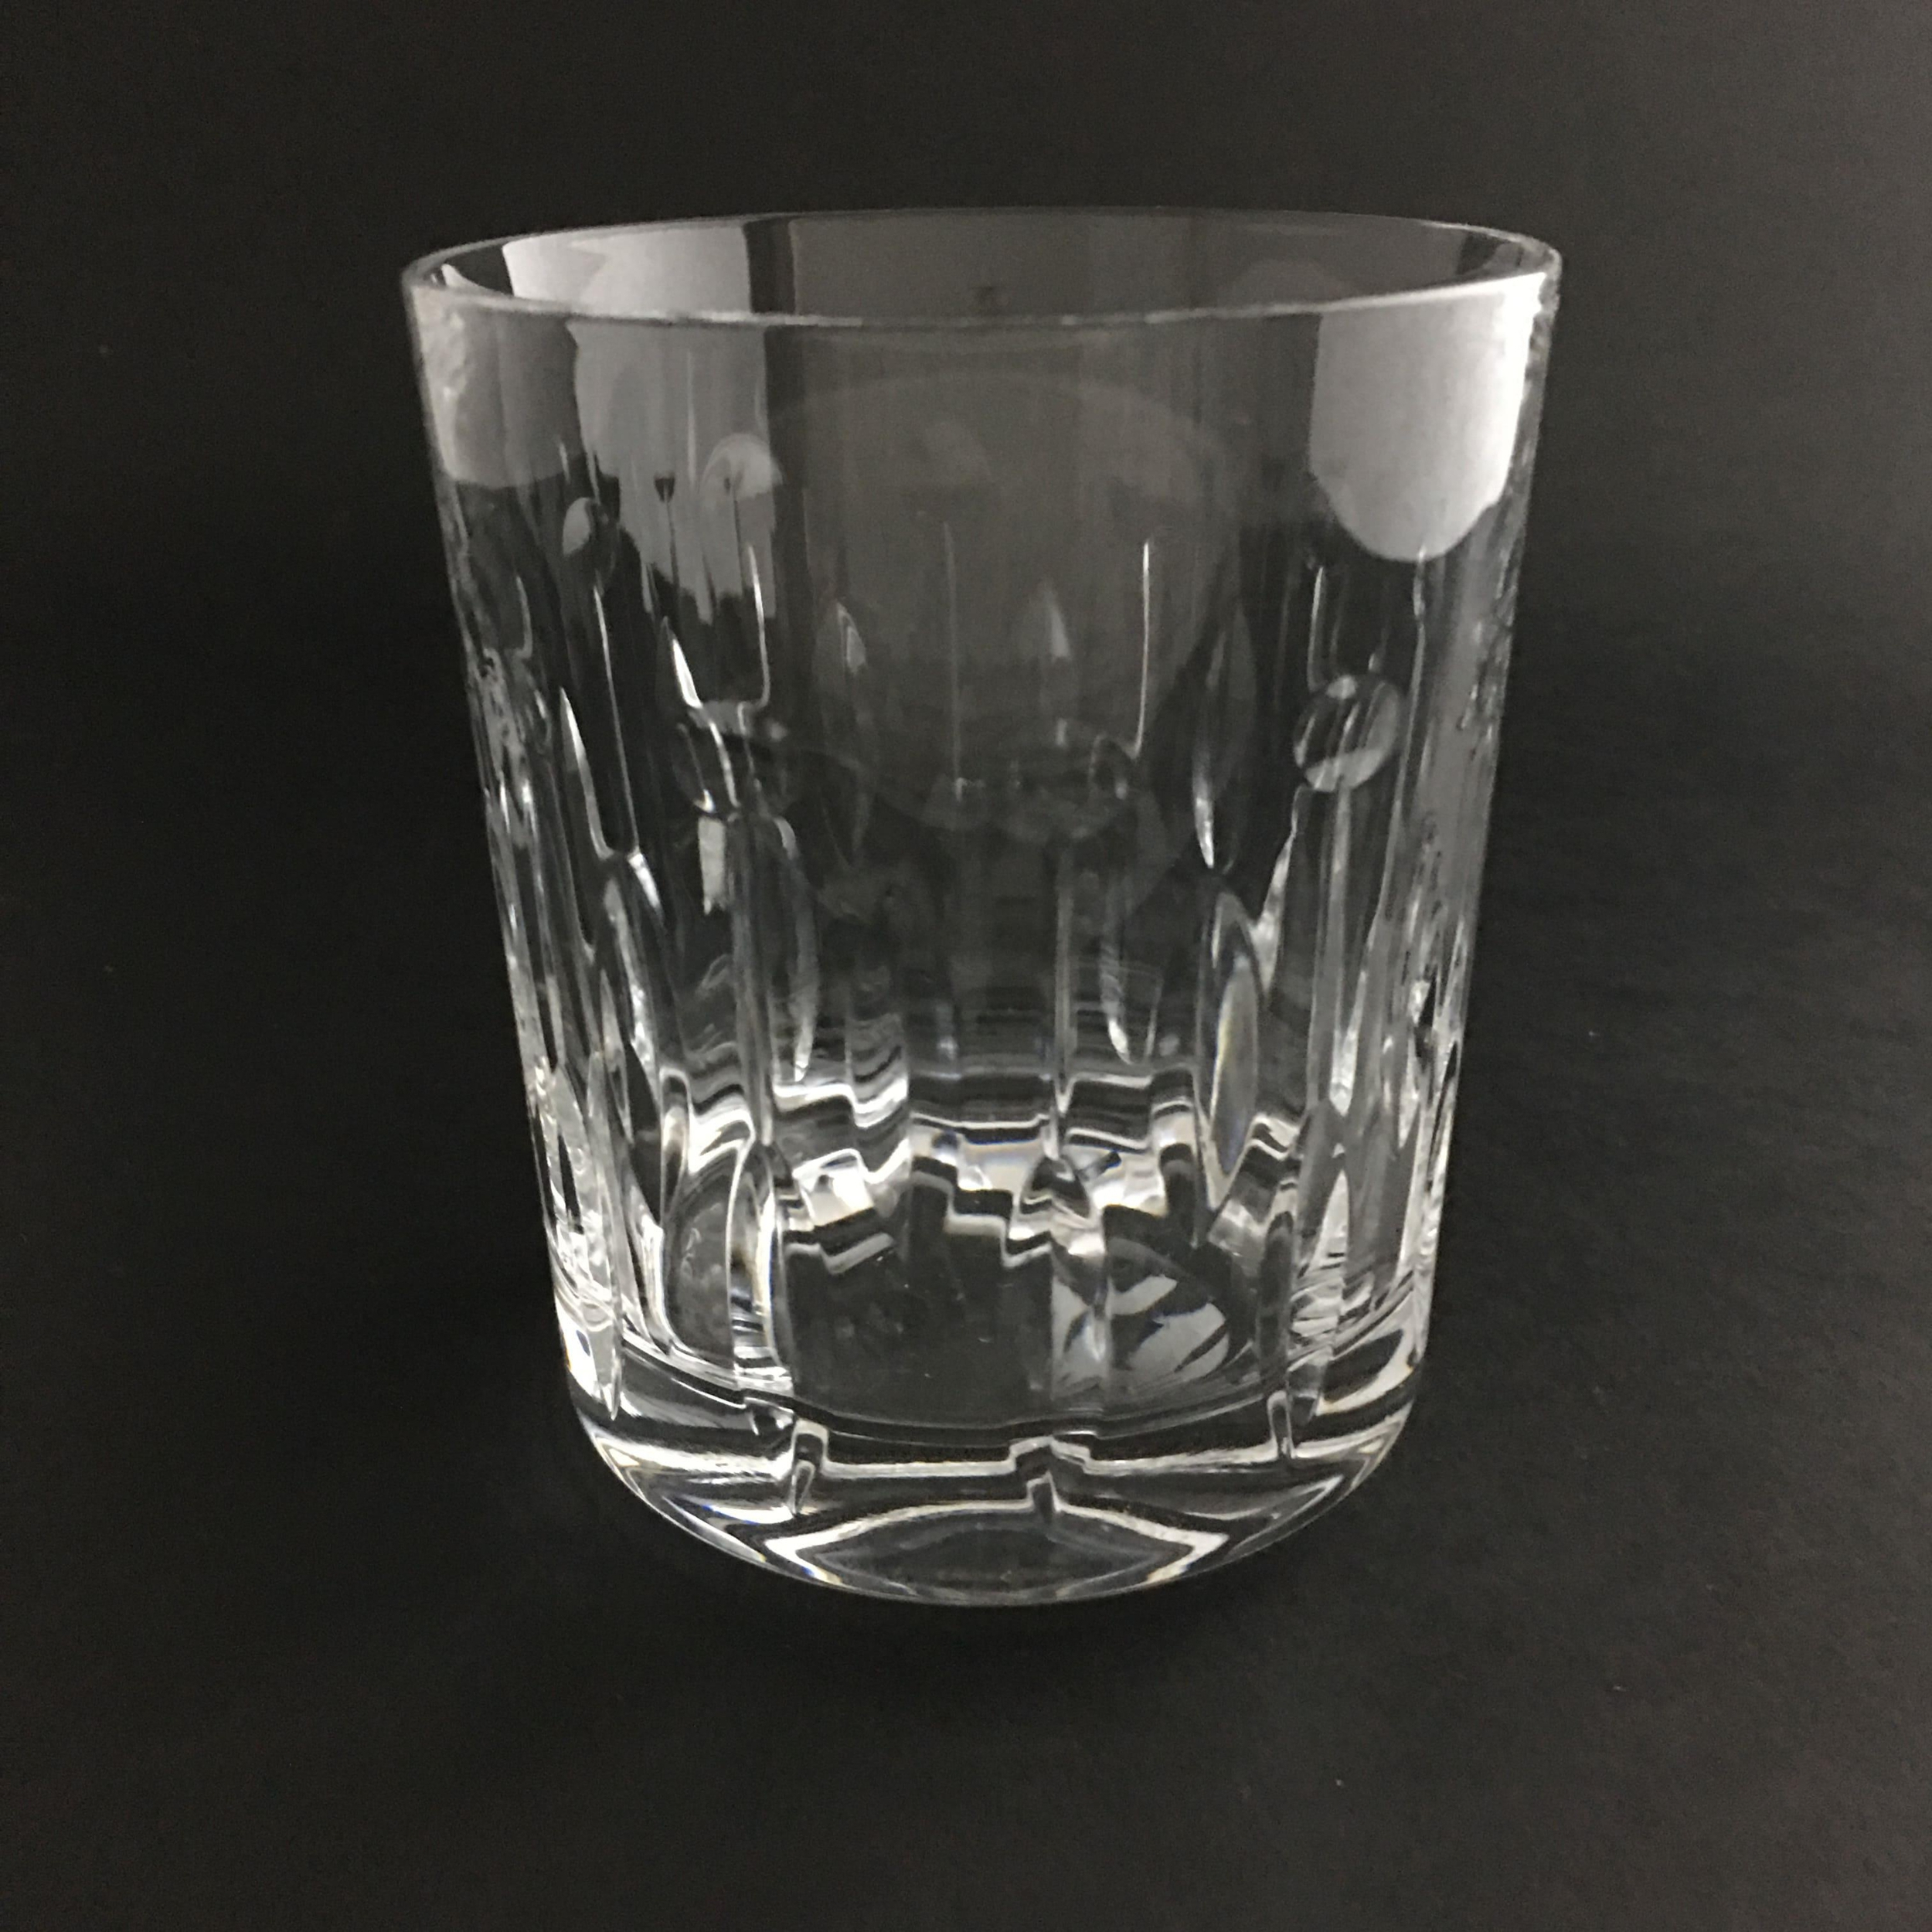 2 Verres à whisky Vence